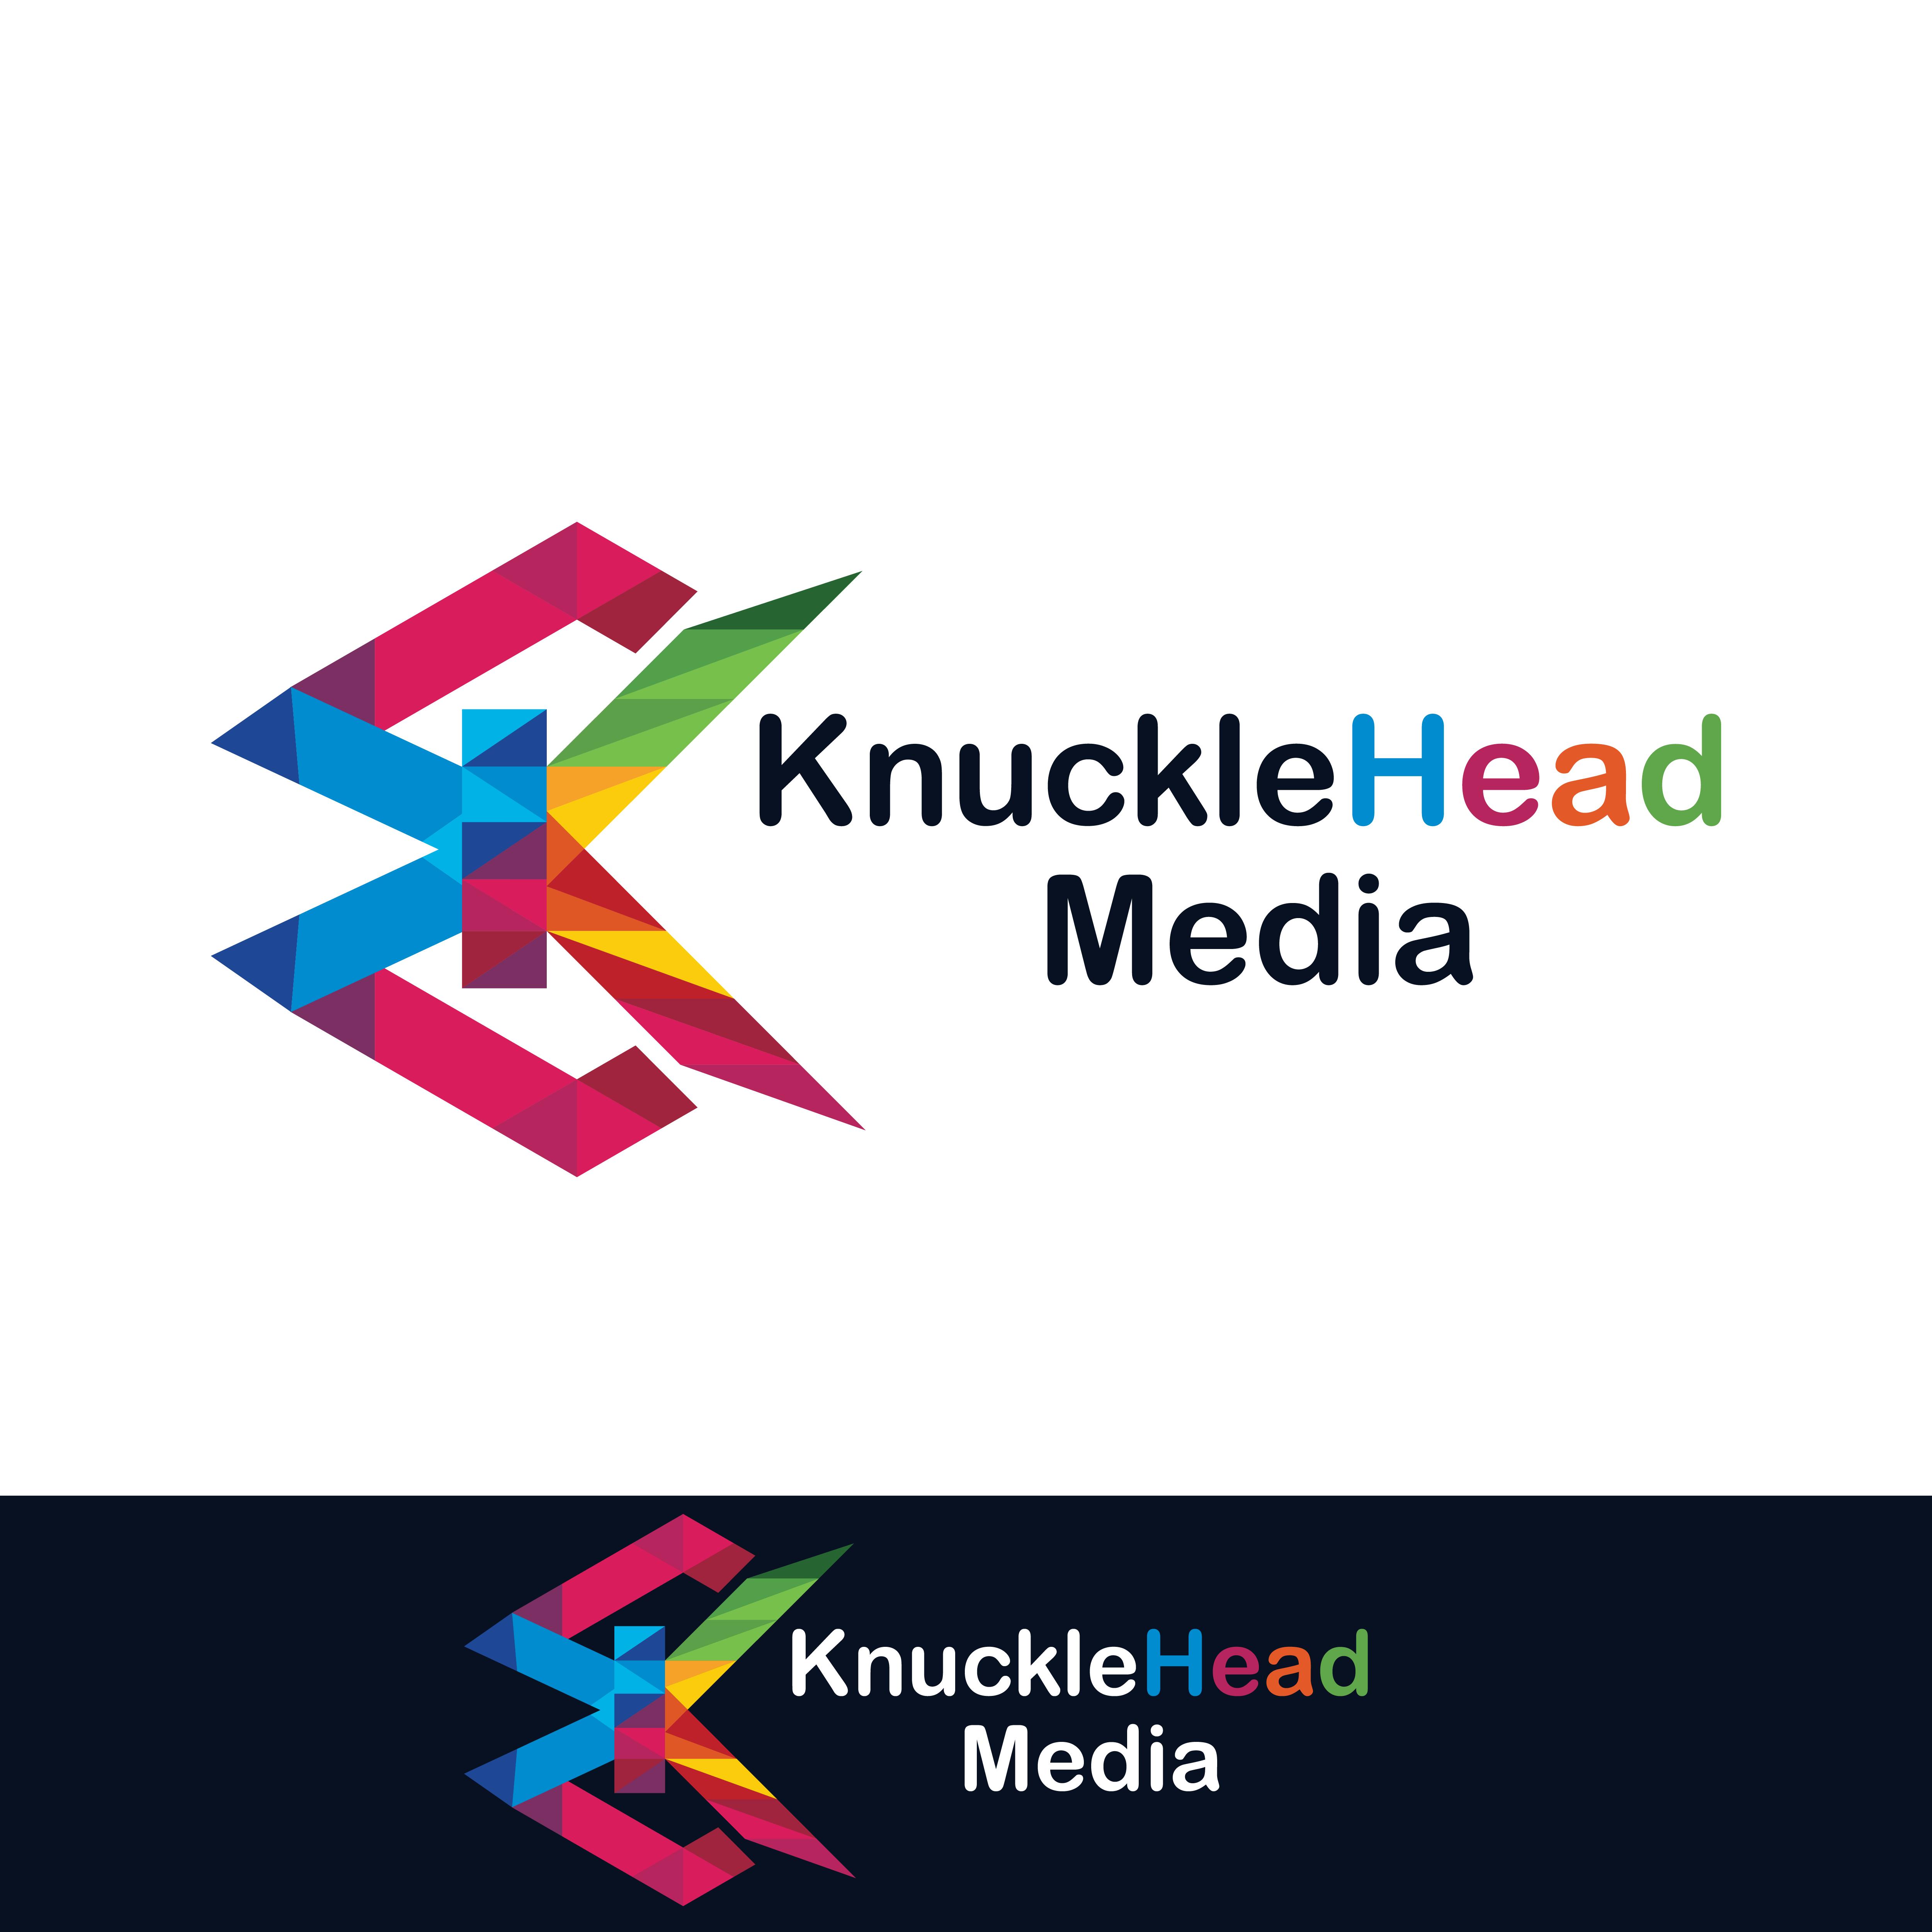 Logo Design by Shakir Alzadjali - Entry No. 1 in the Logo Design Contest Imaginative Logo Design for knucklehead media.